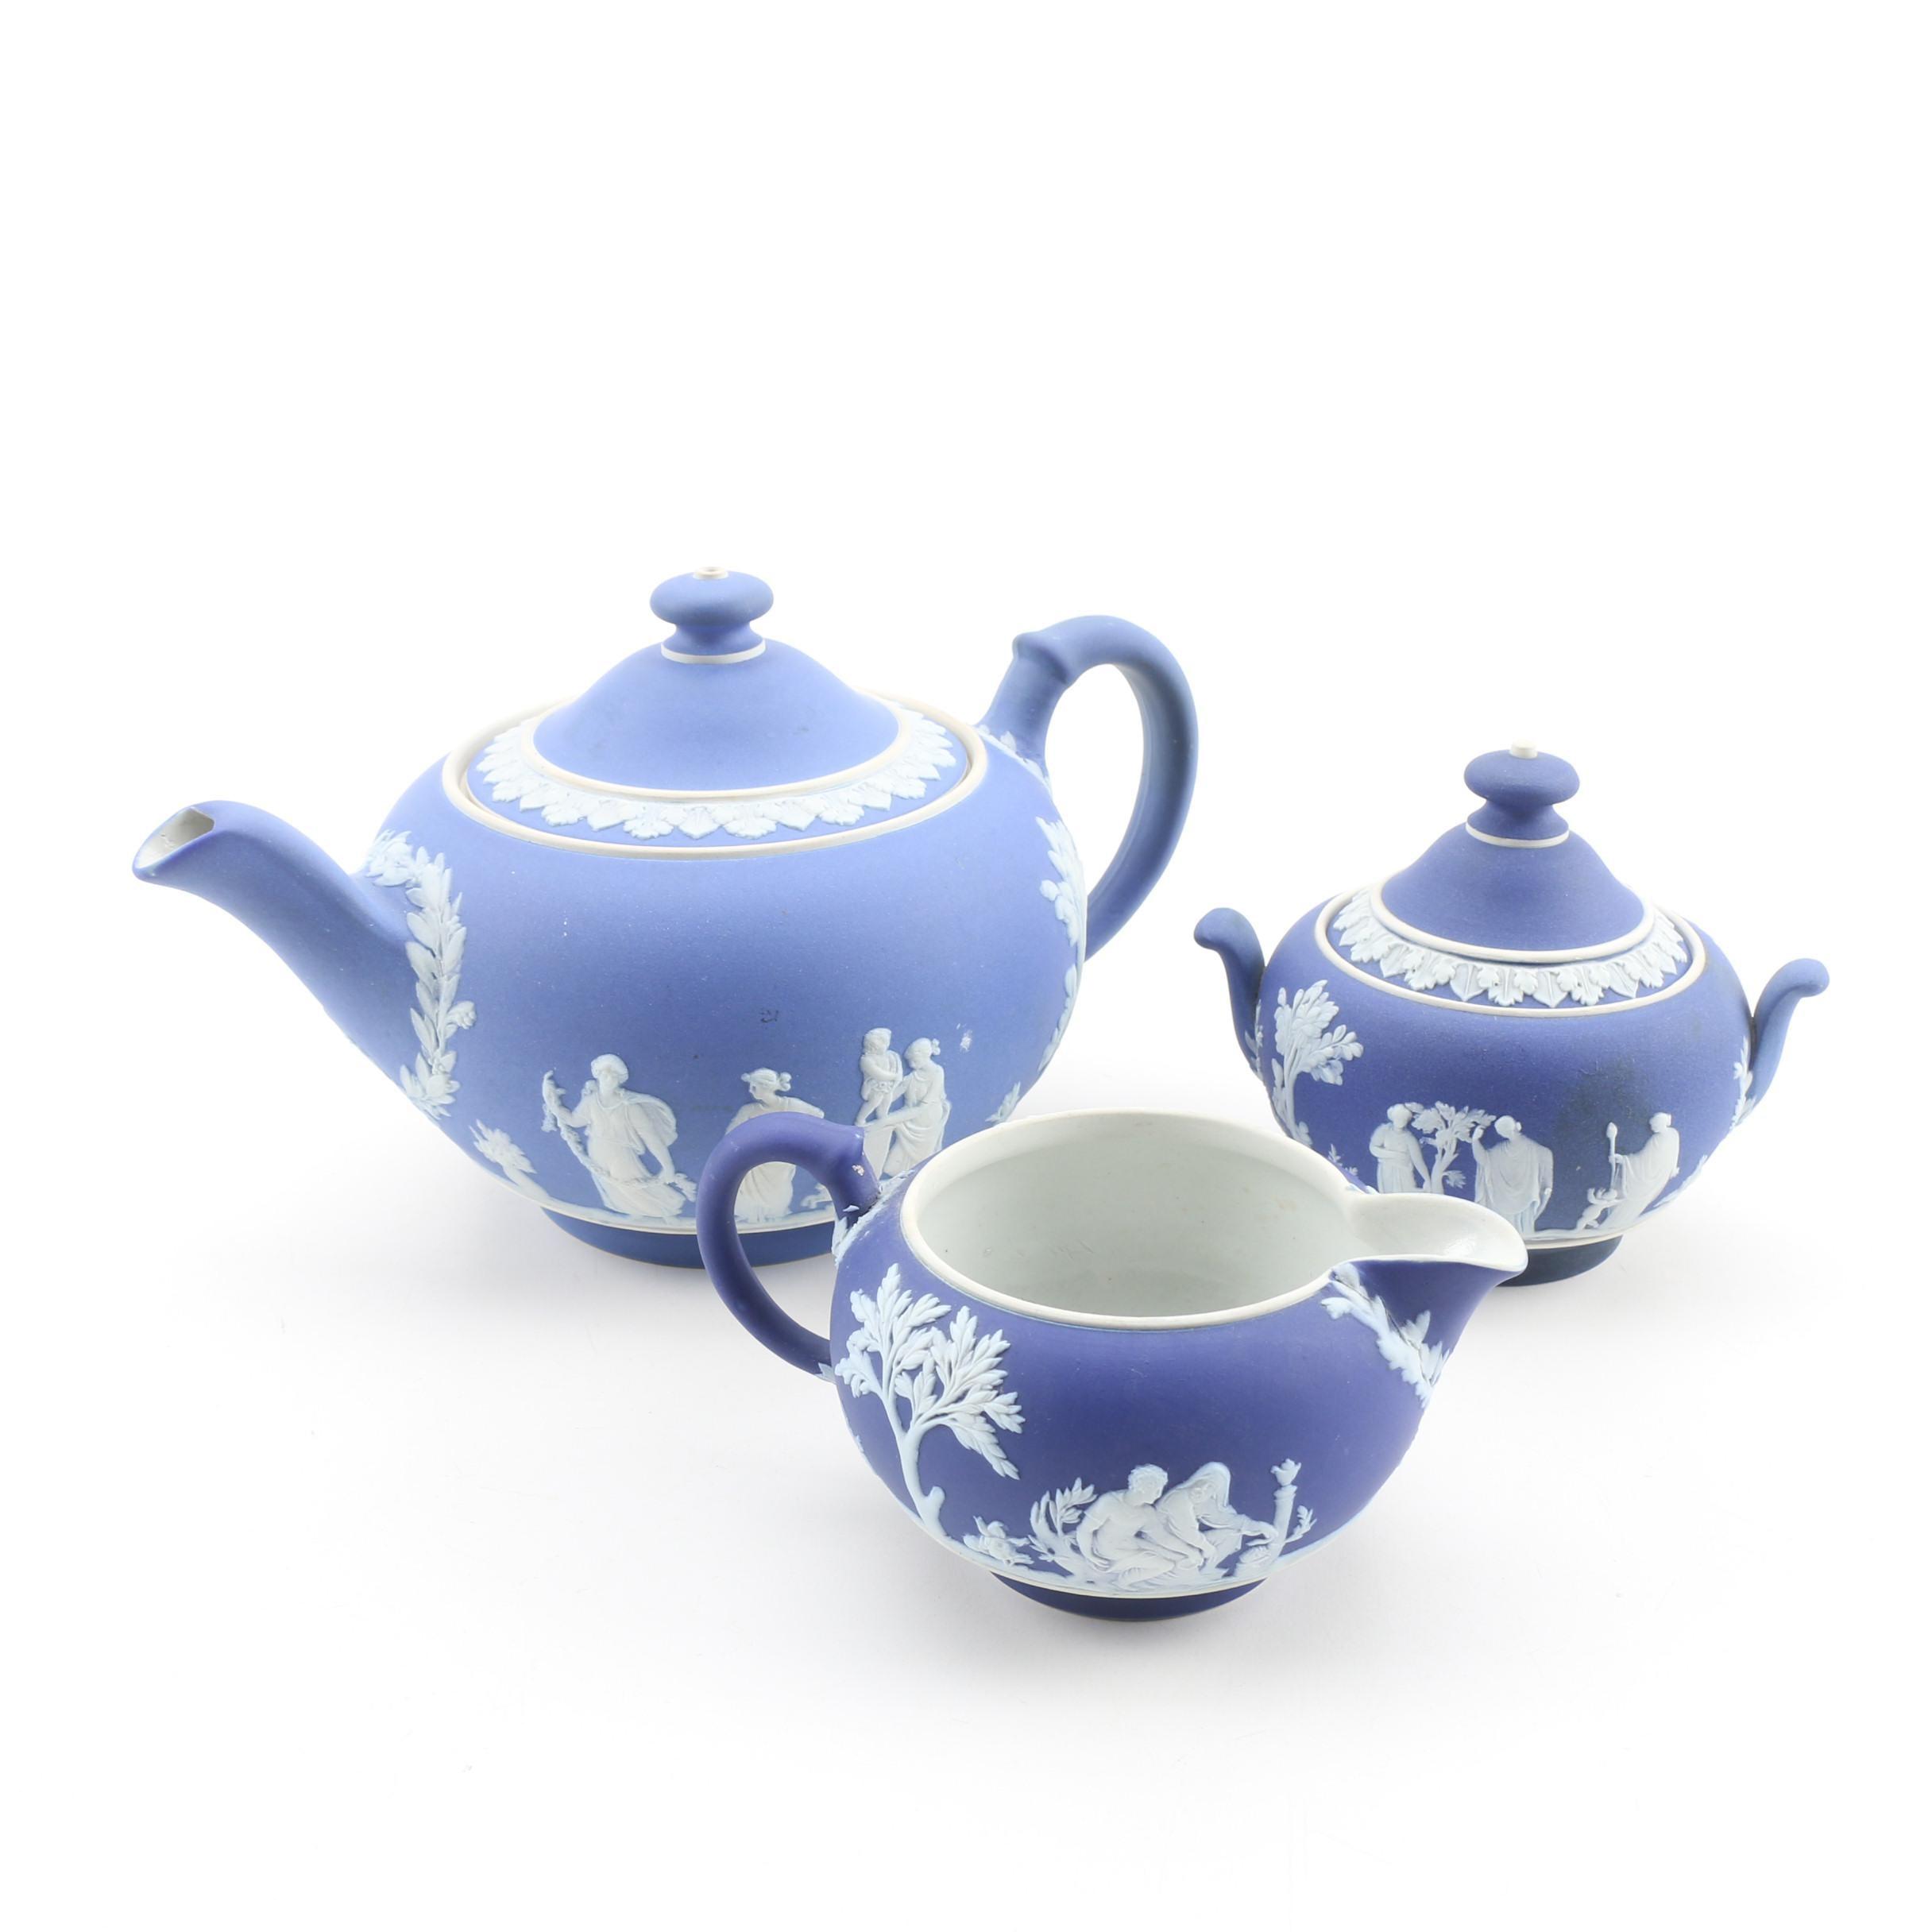 "Wedgwood ""Cream on Portland Blue"" Jasperware Teapot, Creamer, and Sugar Bowl"